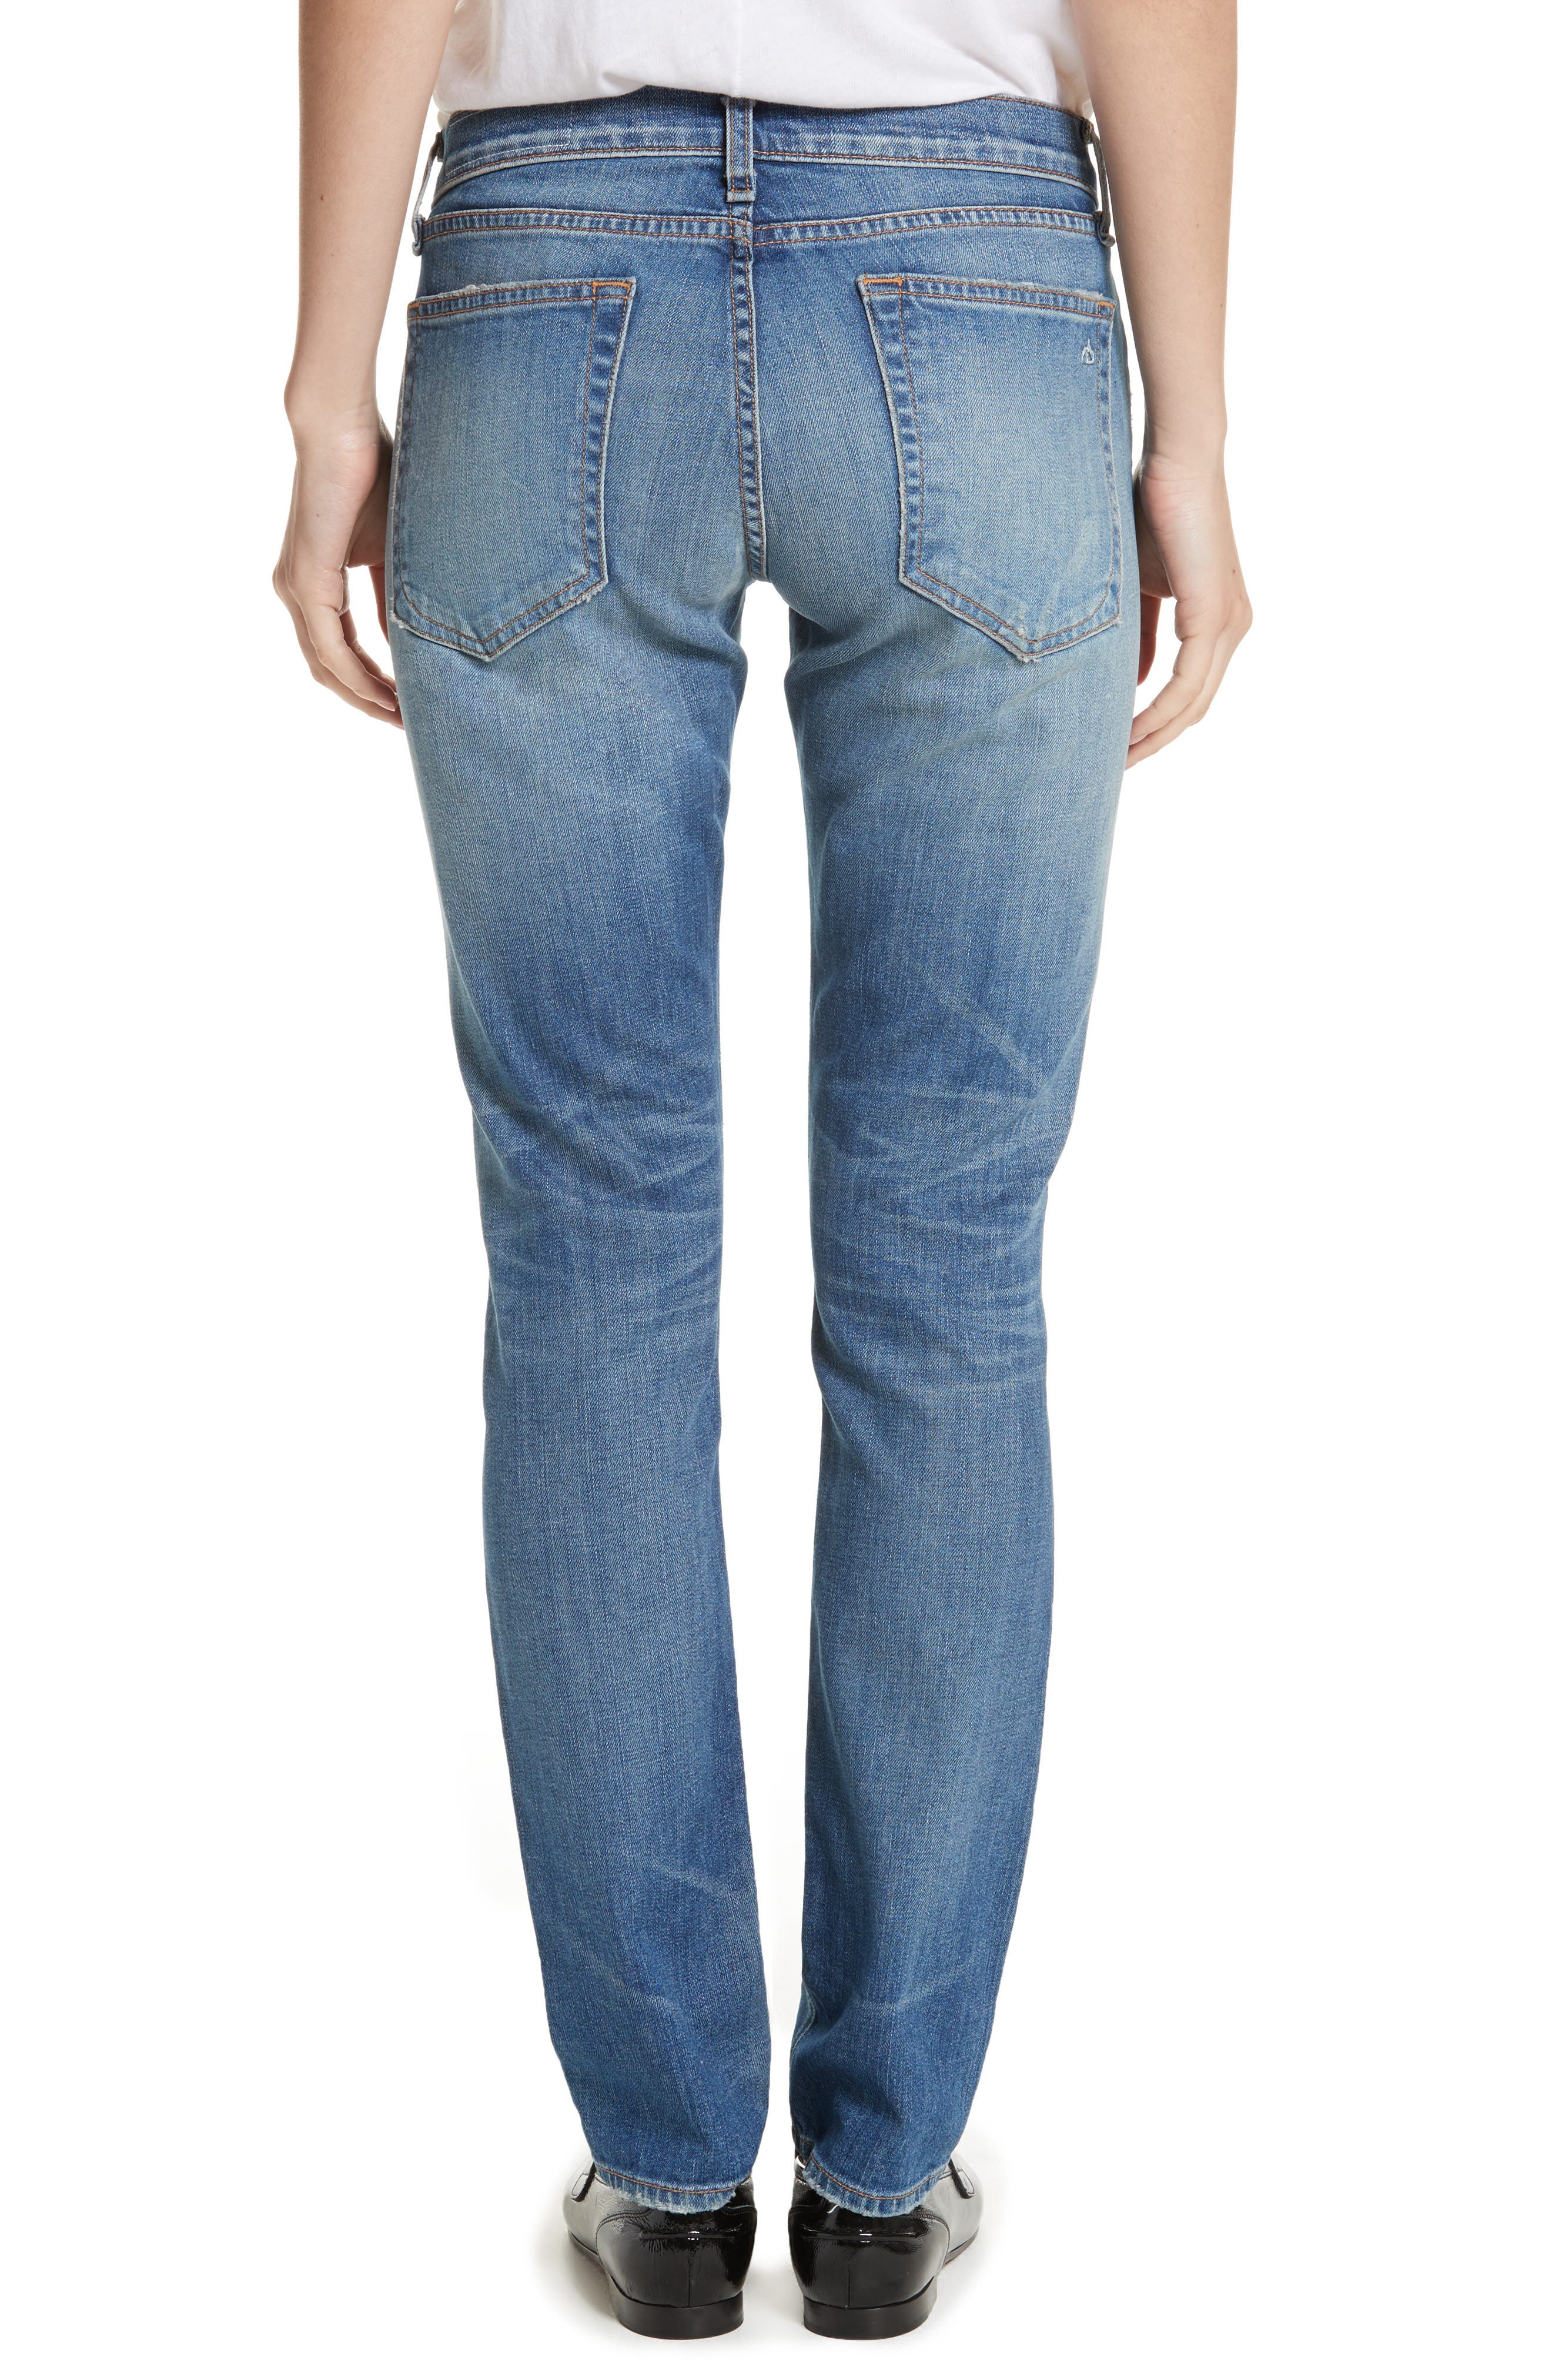 Alternate Image 2  - rag & bone/JEAN Dre Slim Boyfriend Jeans (Ervs)